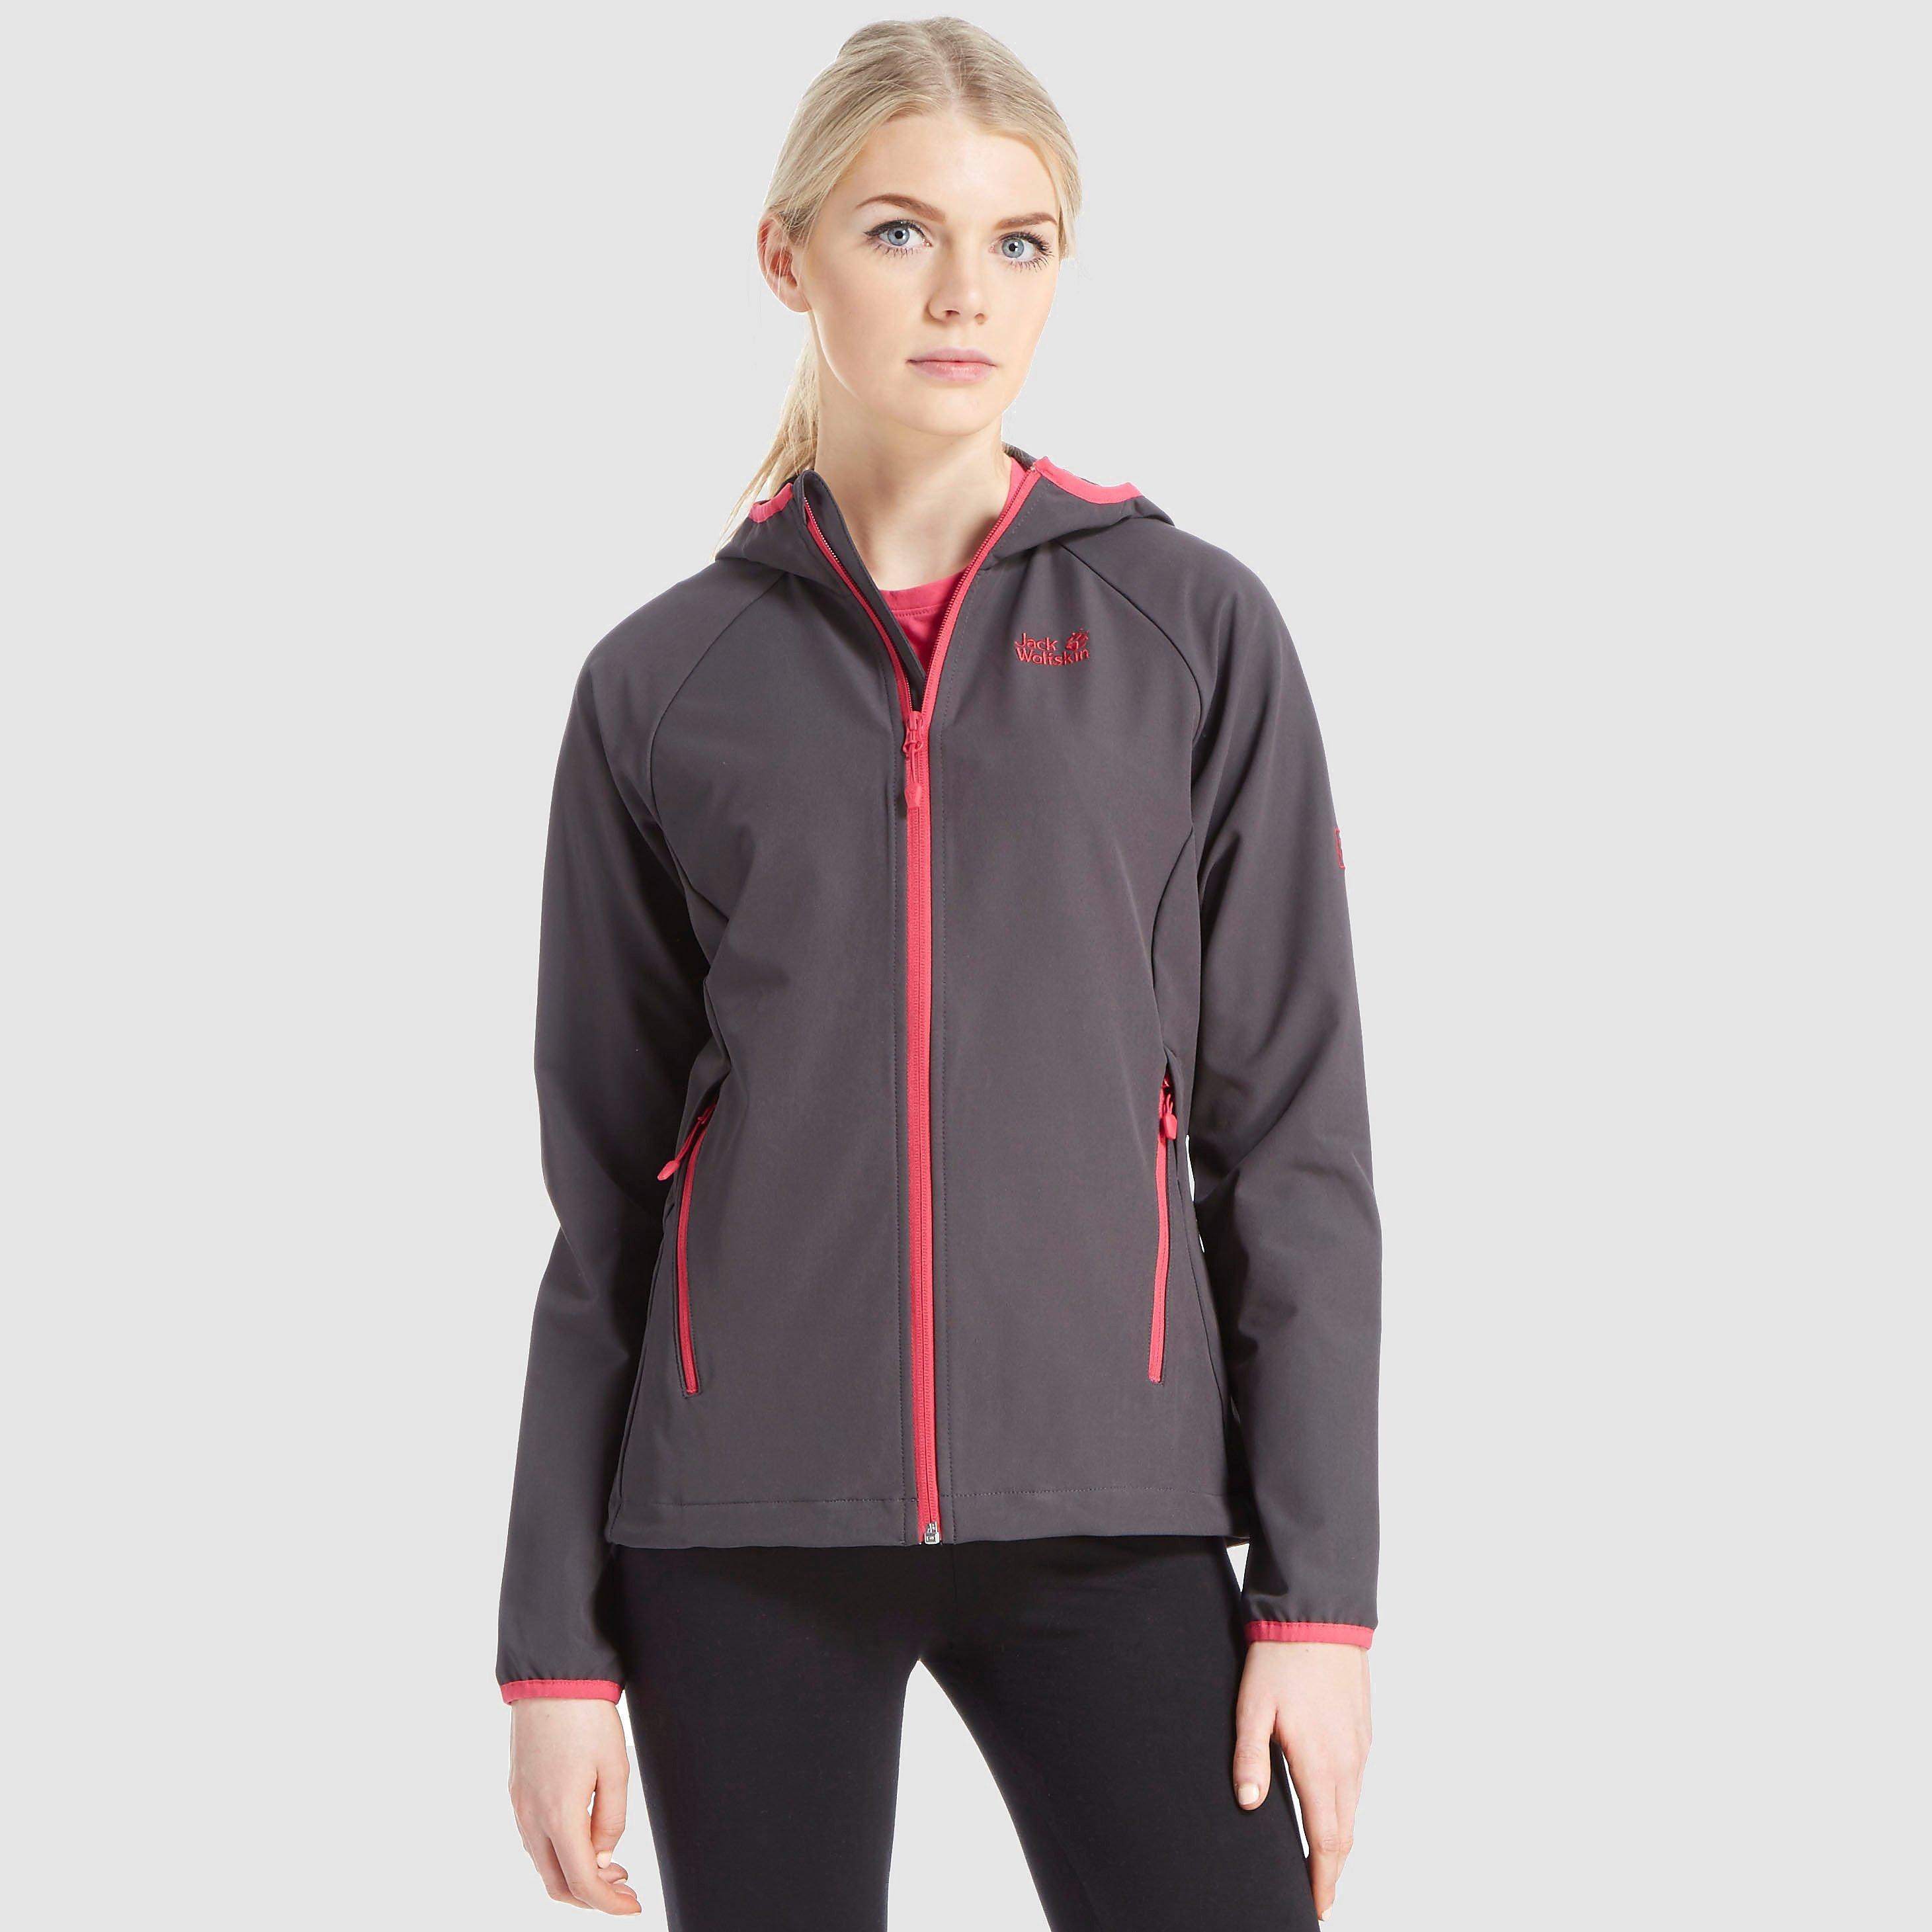 Jack Wolfskin Turbulence Women's Softshell Jacket